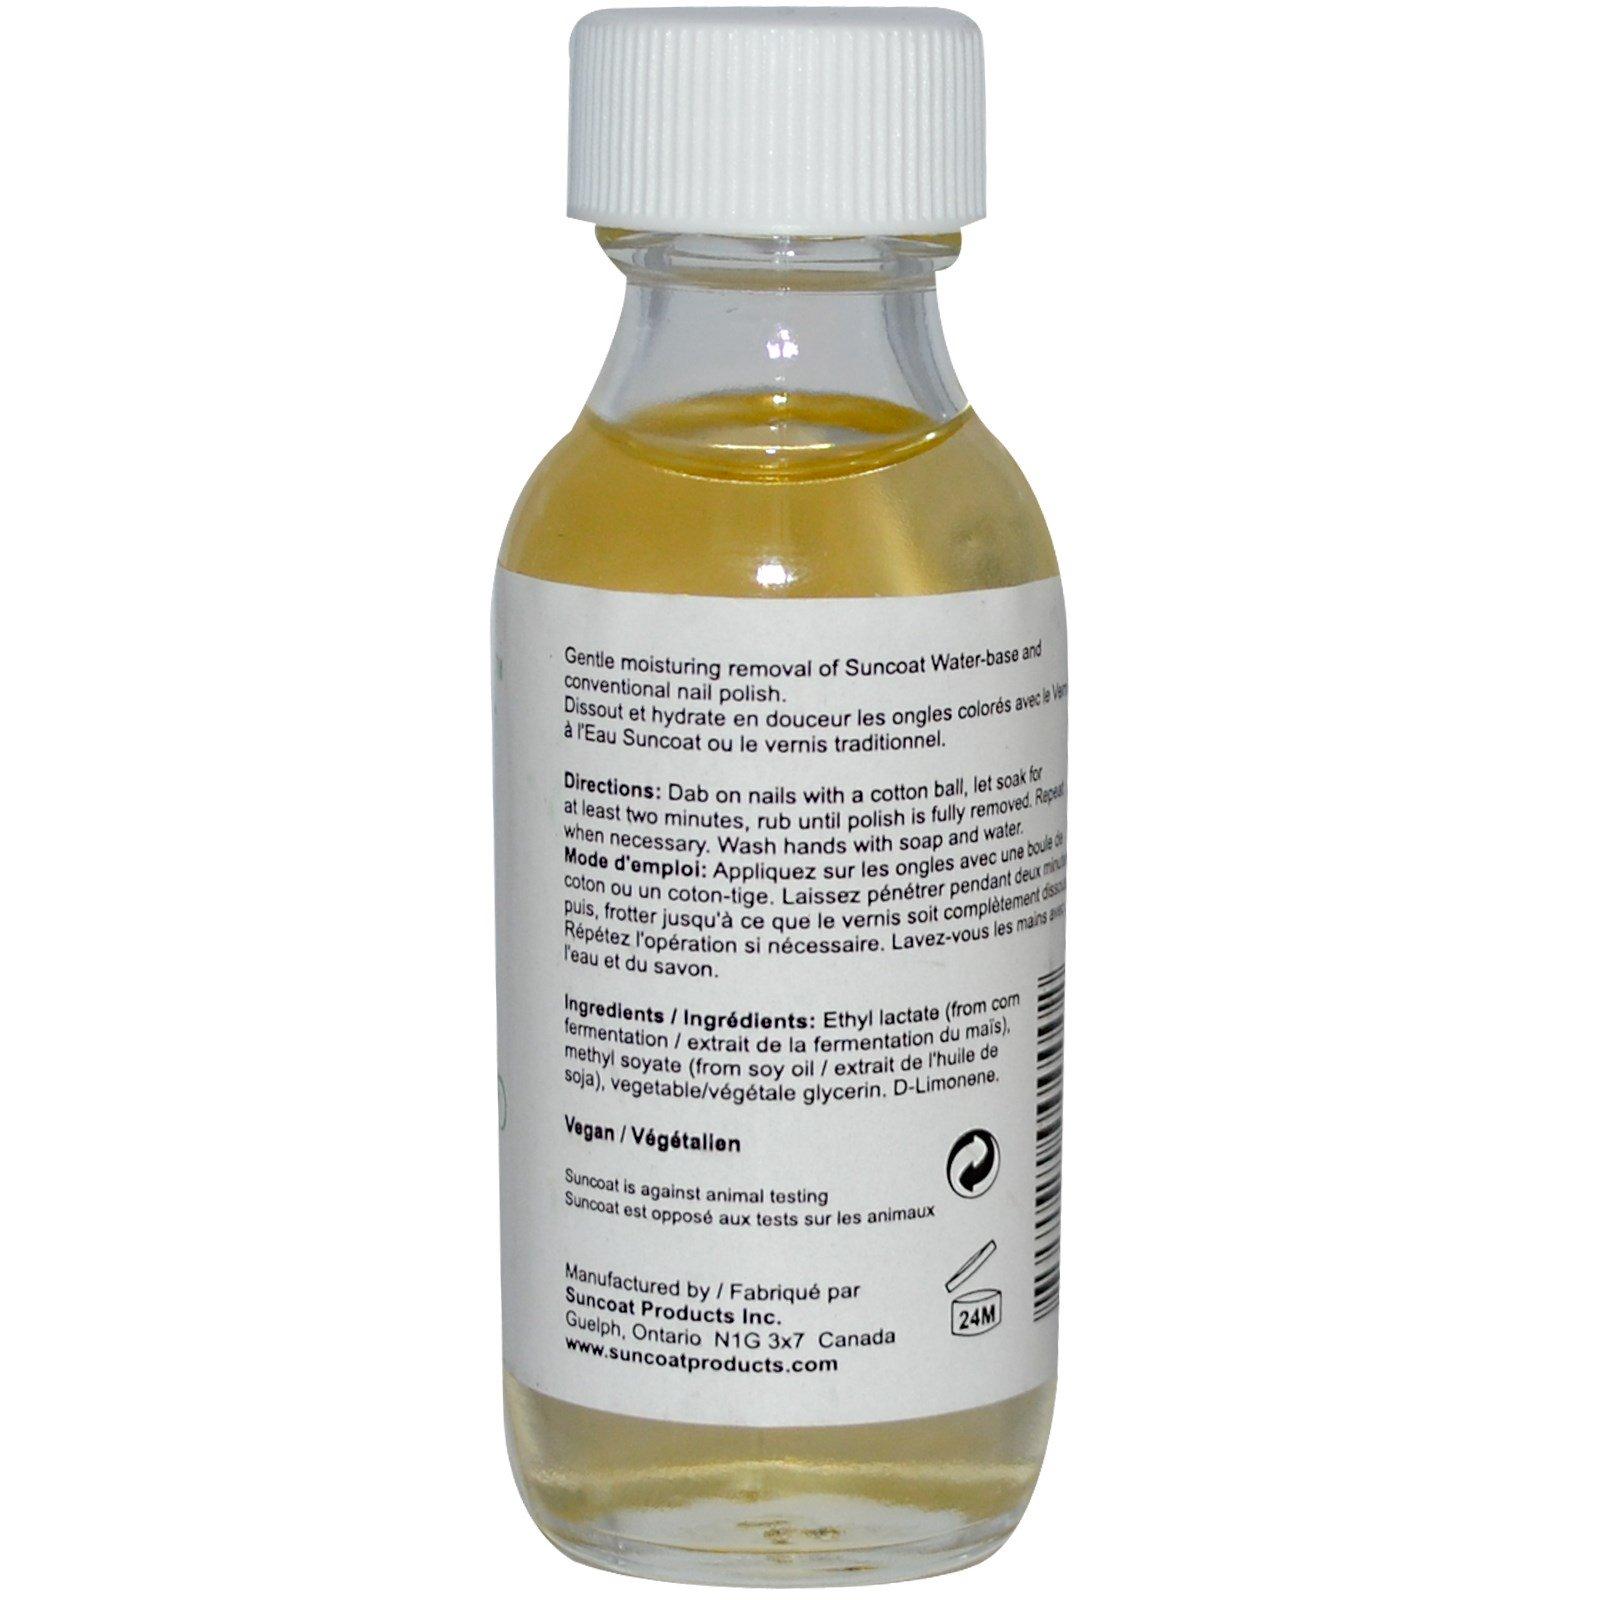 Suncoat, Natural Nail Polish Remover, 1 fl oz (30 ml) - iHerb.com